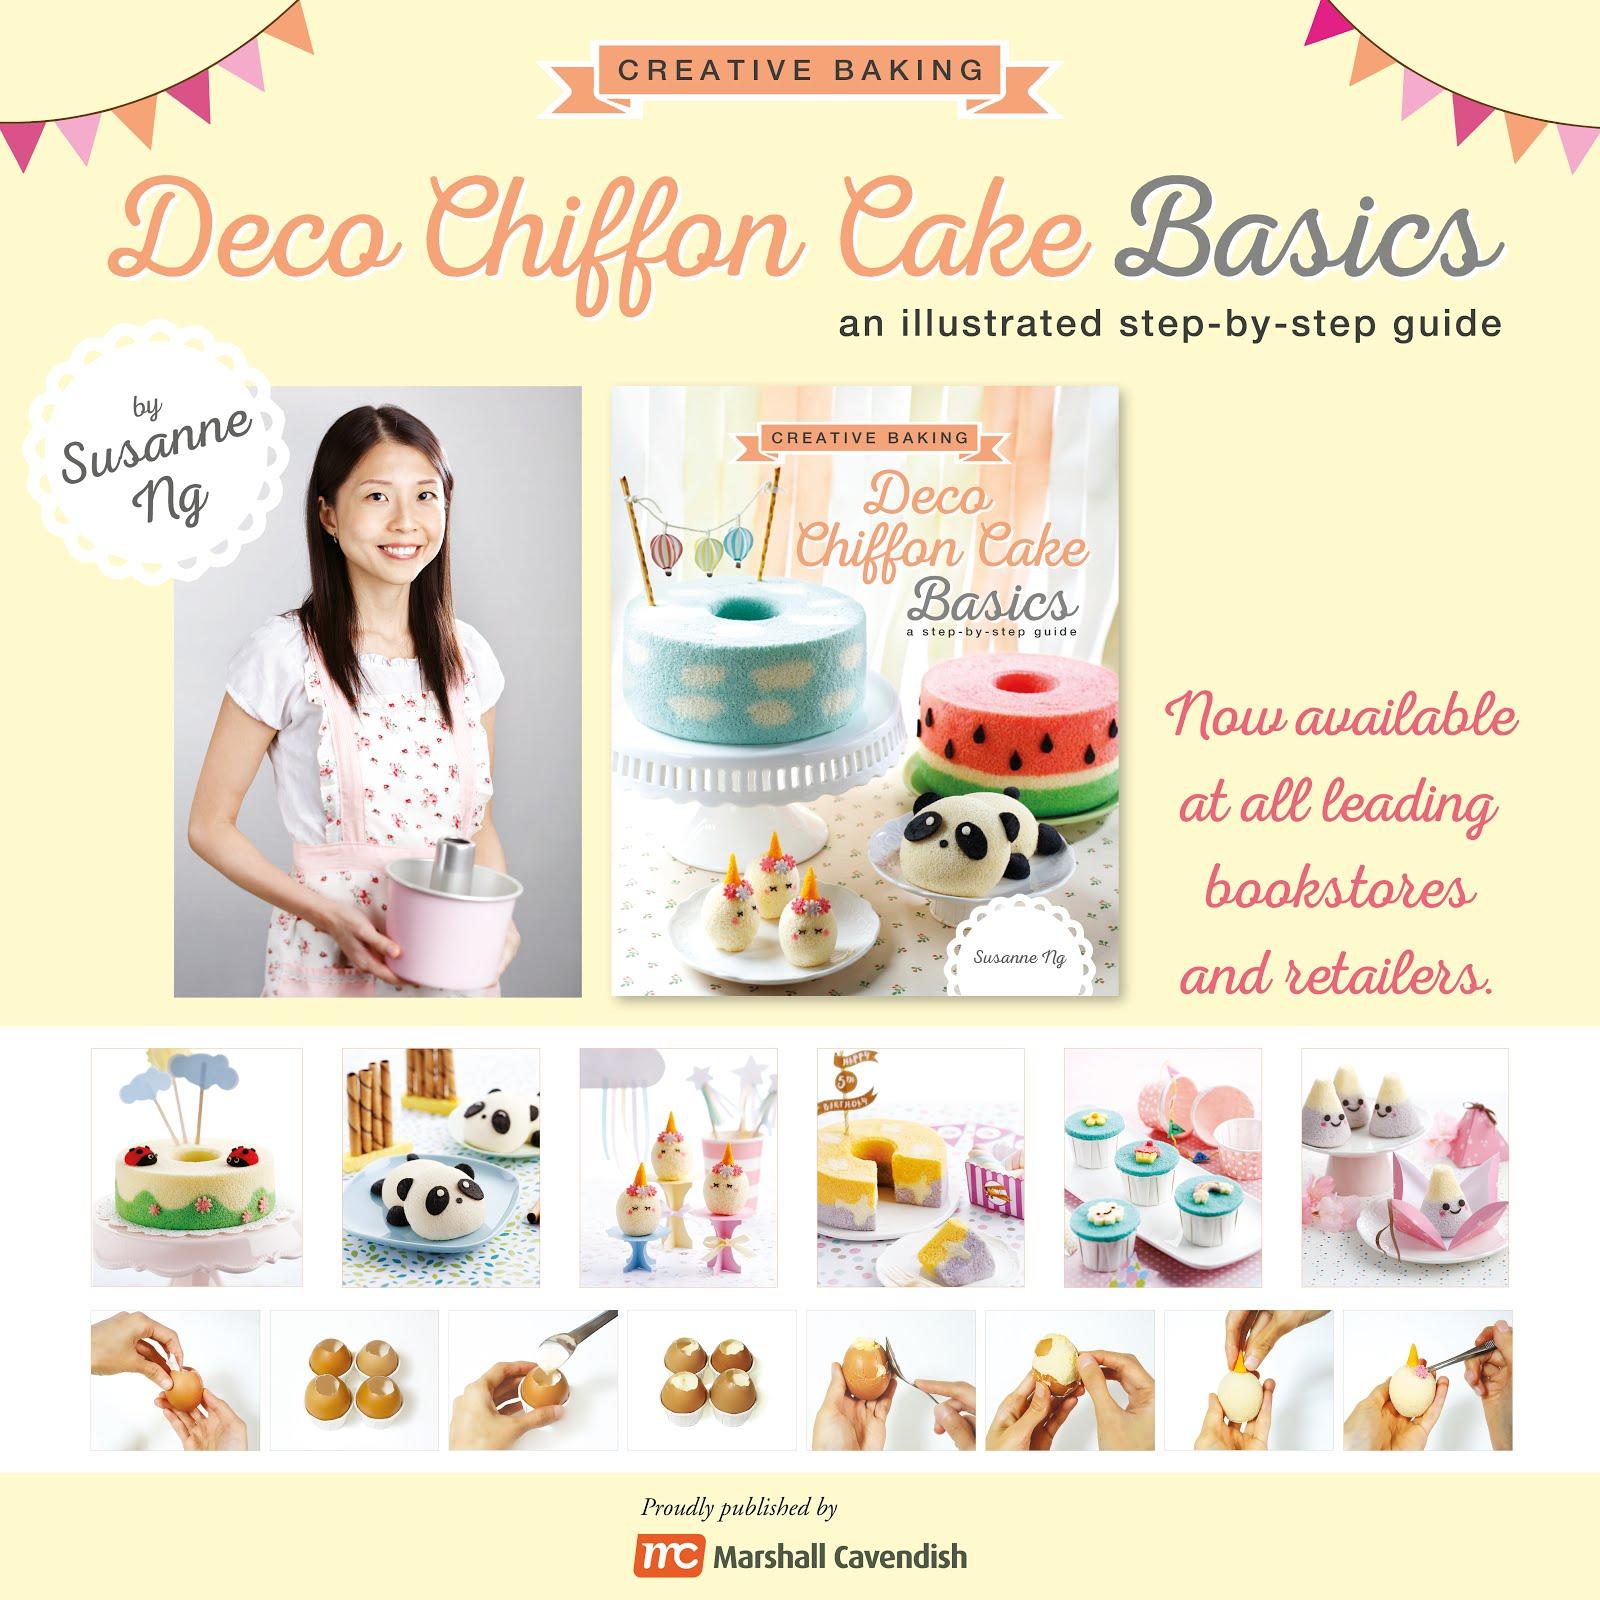 Deco Chiffon Cake Basics